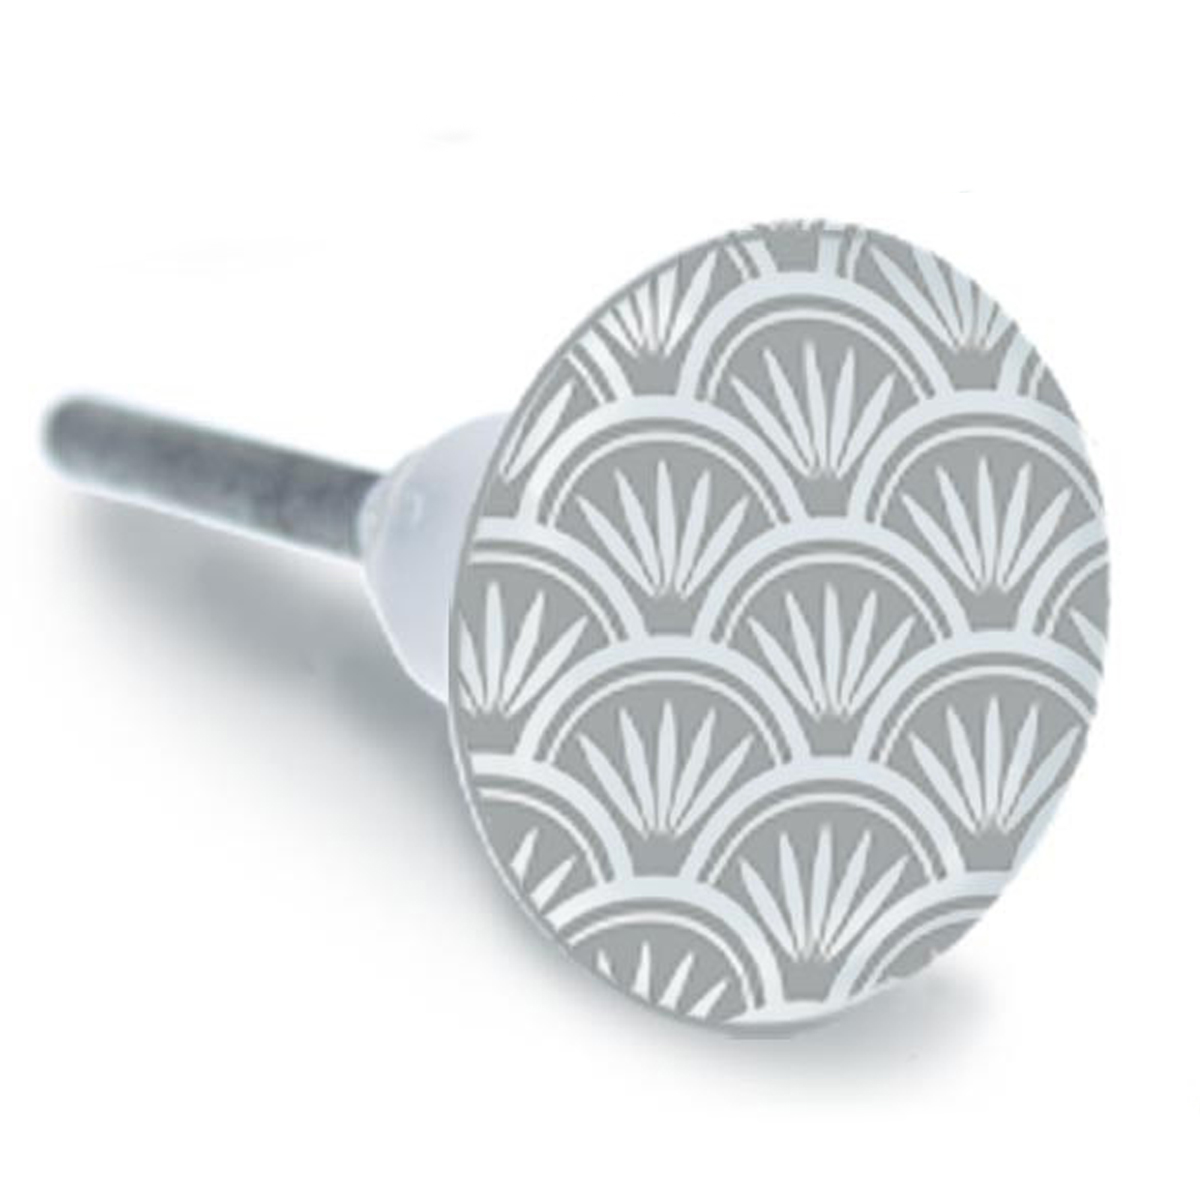 Bouton meuble céramique \'Boho\' gris - 65x35 mm - [A1936]